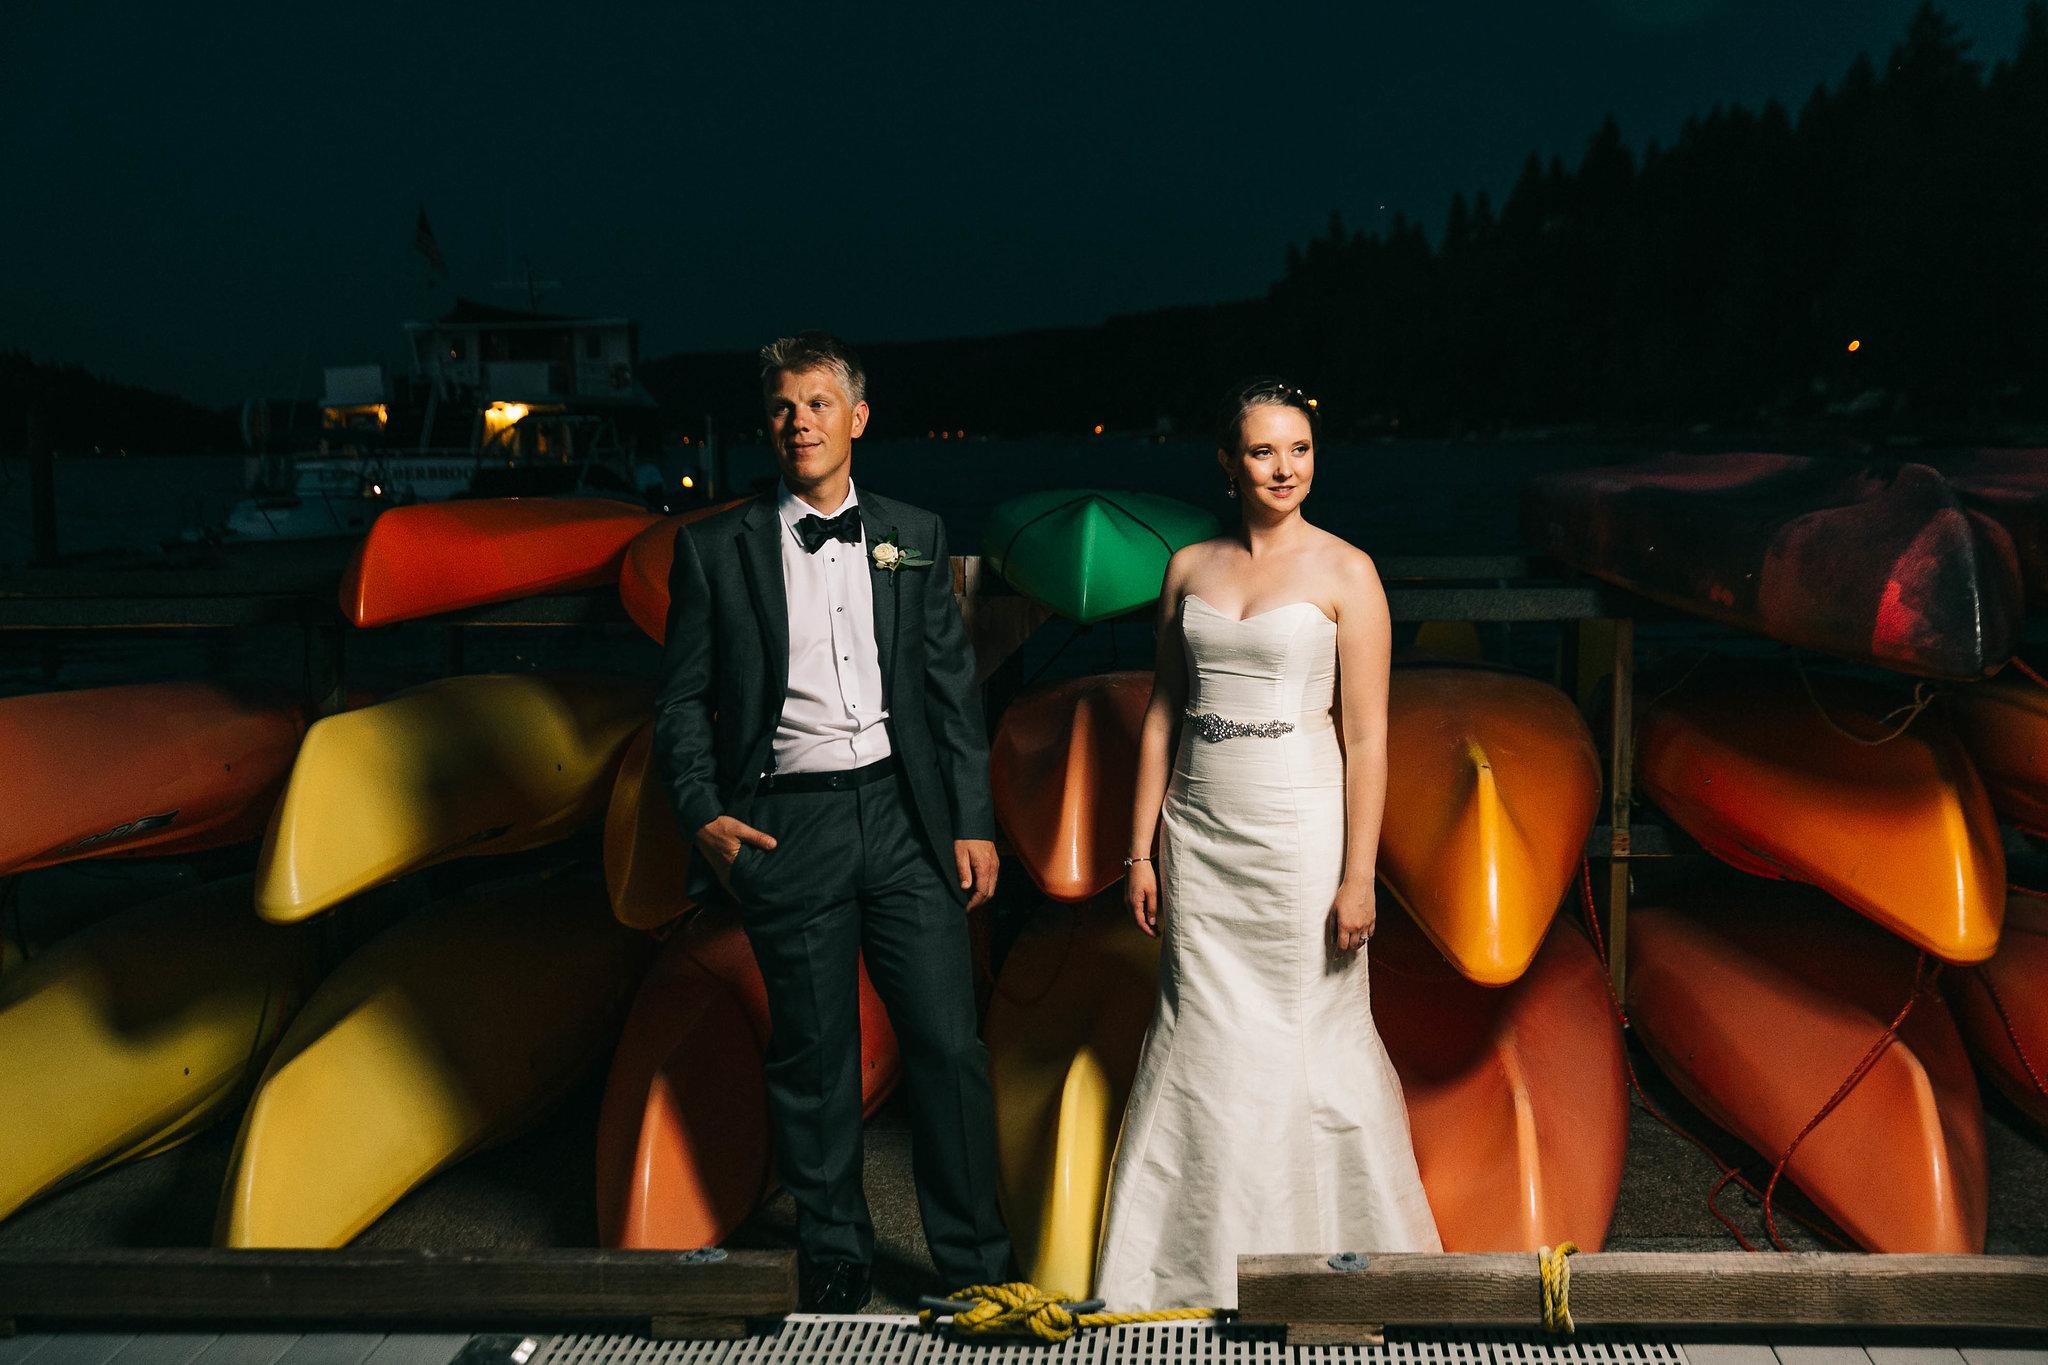 Eivind+Elyse_Alderbrook_Resort_Wedding_Seattle_Wedding_by_Adina_Preston_Weddings_66.JPG